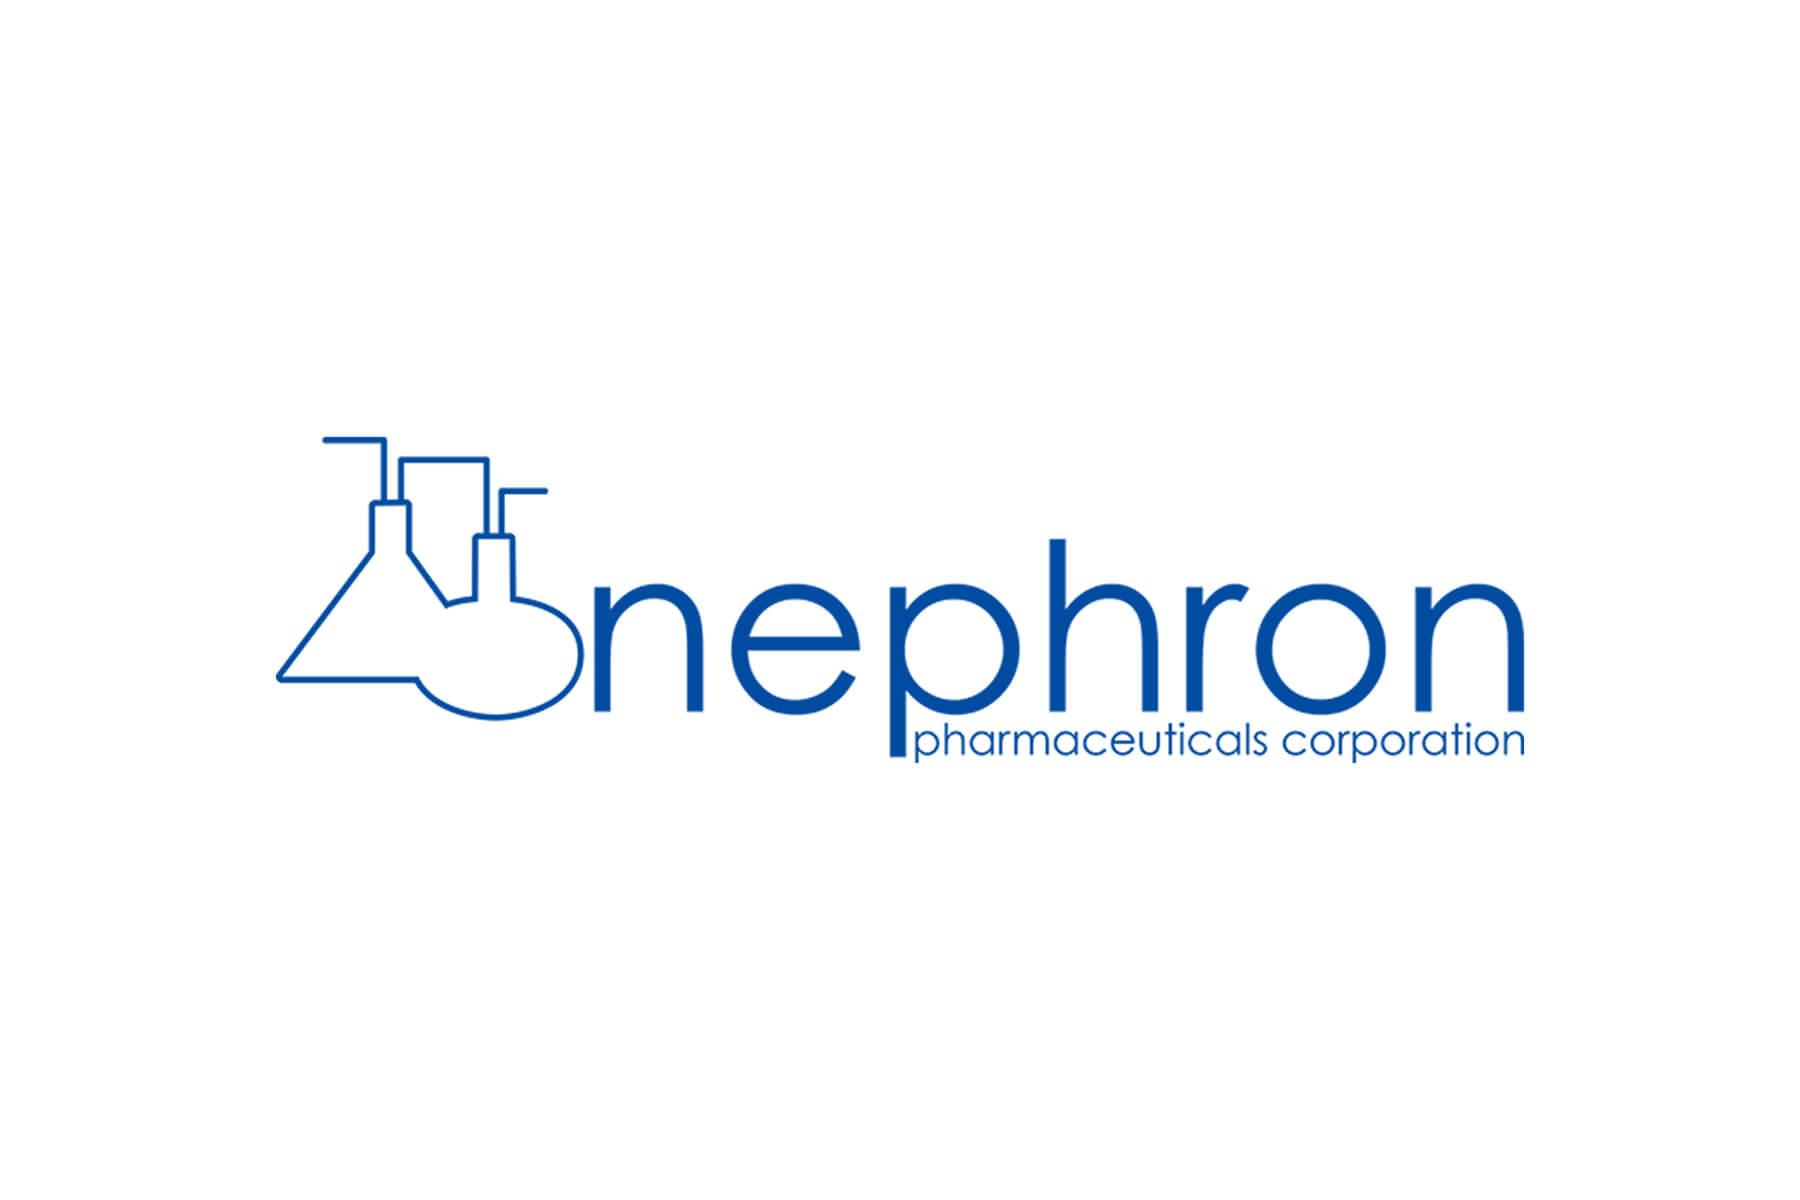 sponsor nephron